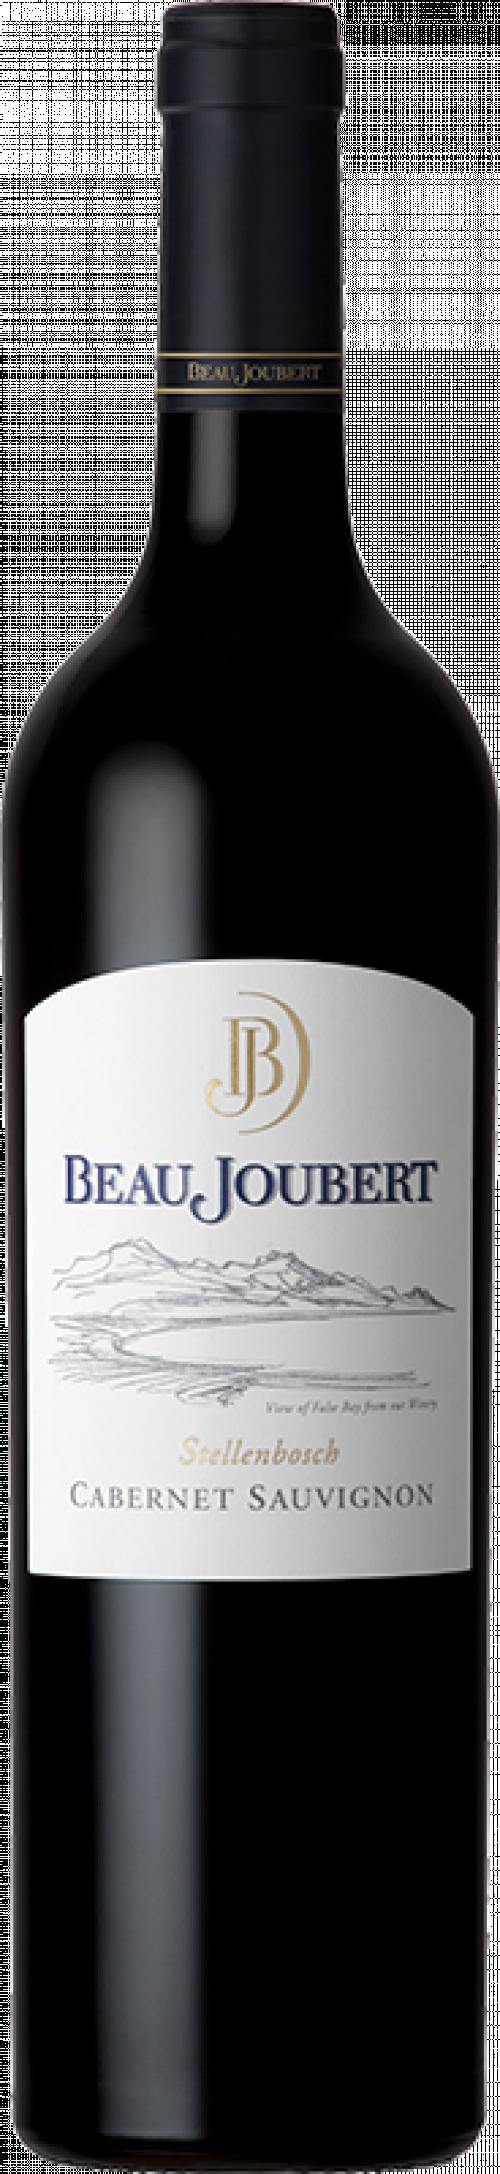 Beau Joubert Cabernet Sauvignon 750ml